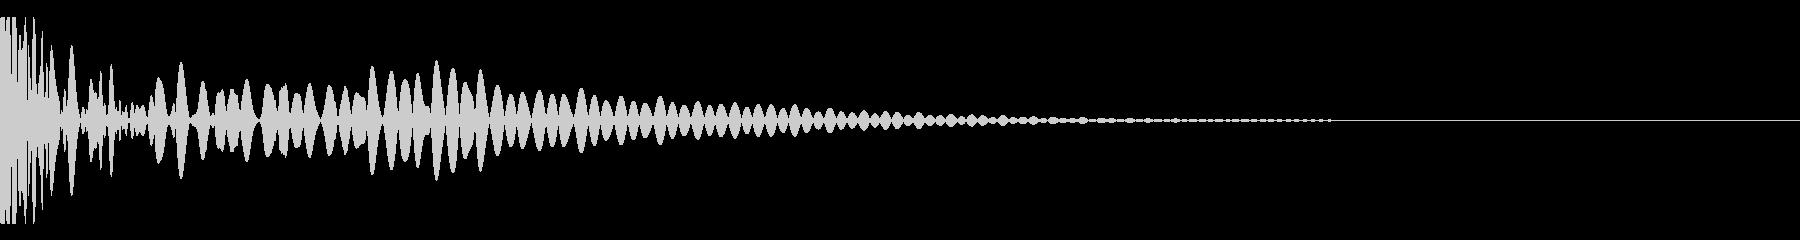 DTM Tom 27 オリジナル音源の未再生の波形